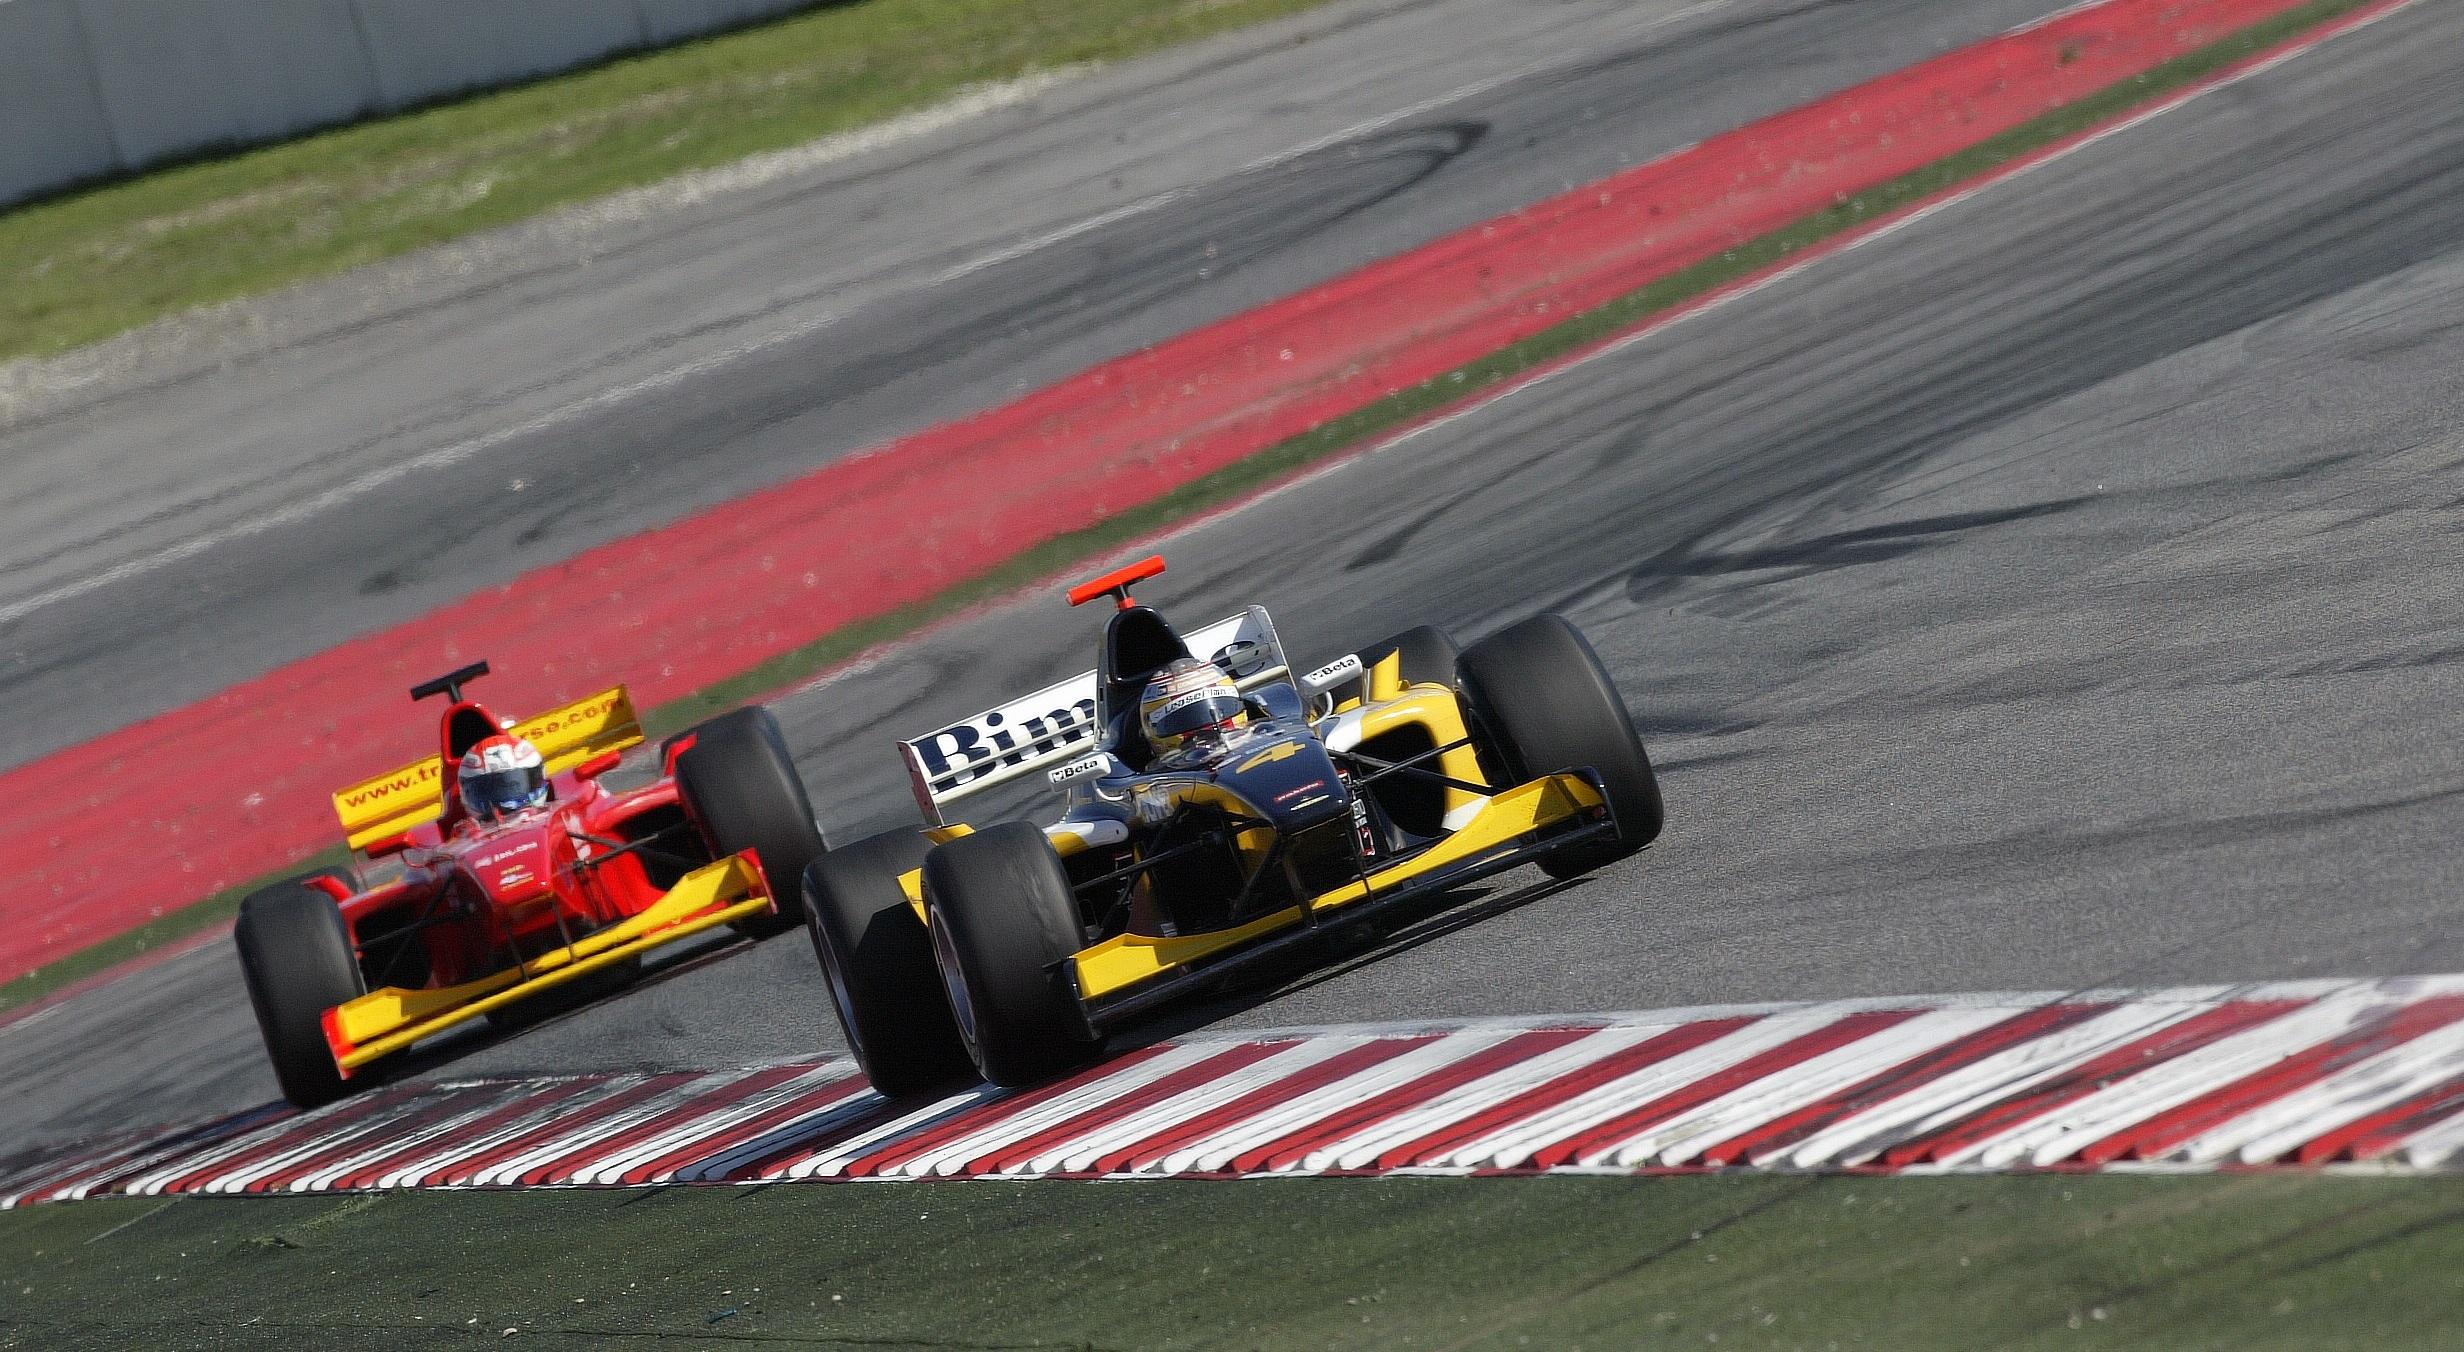 Roldán Rodríguez Euroseries 3000, 2006